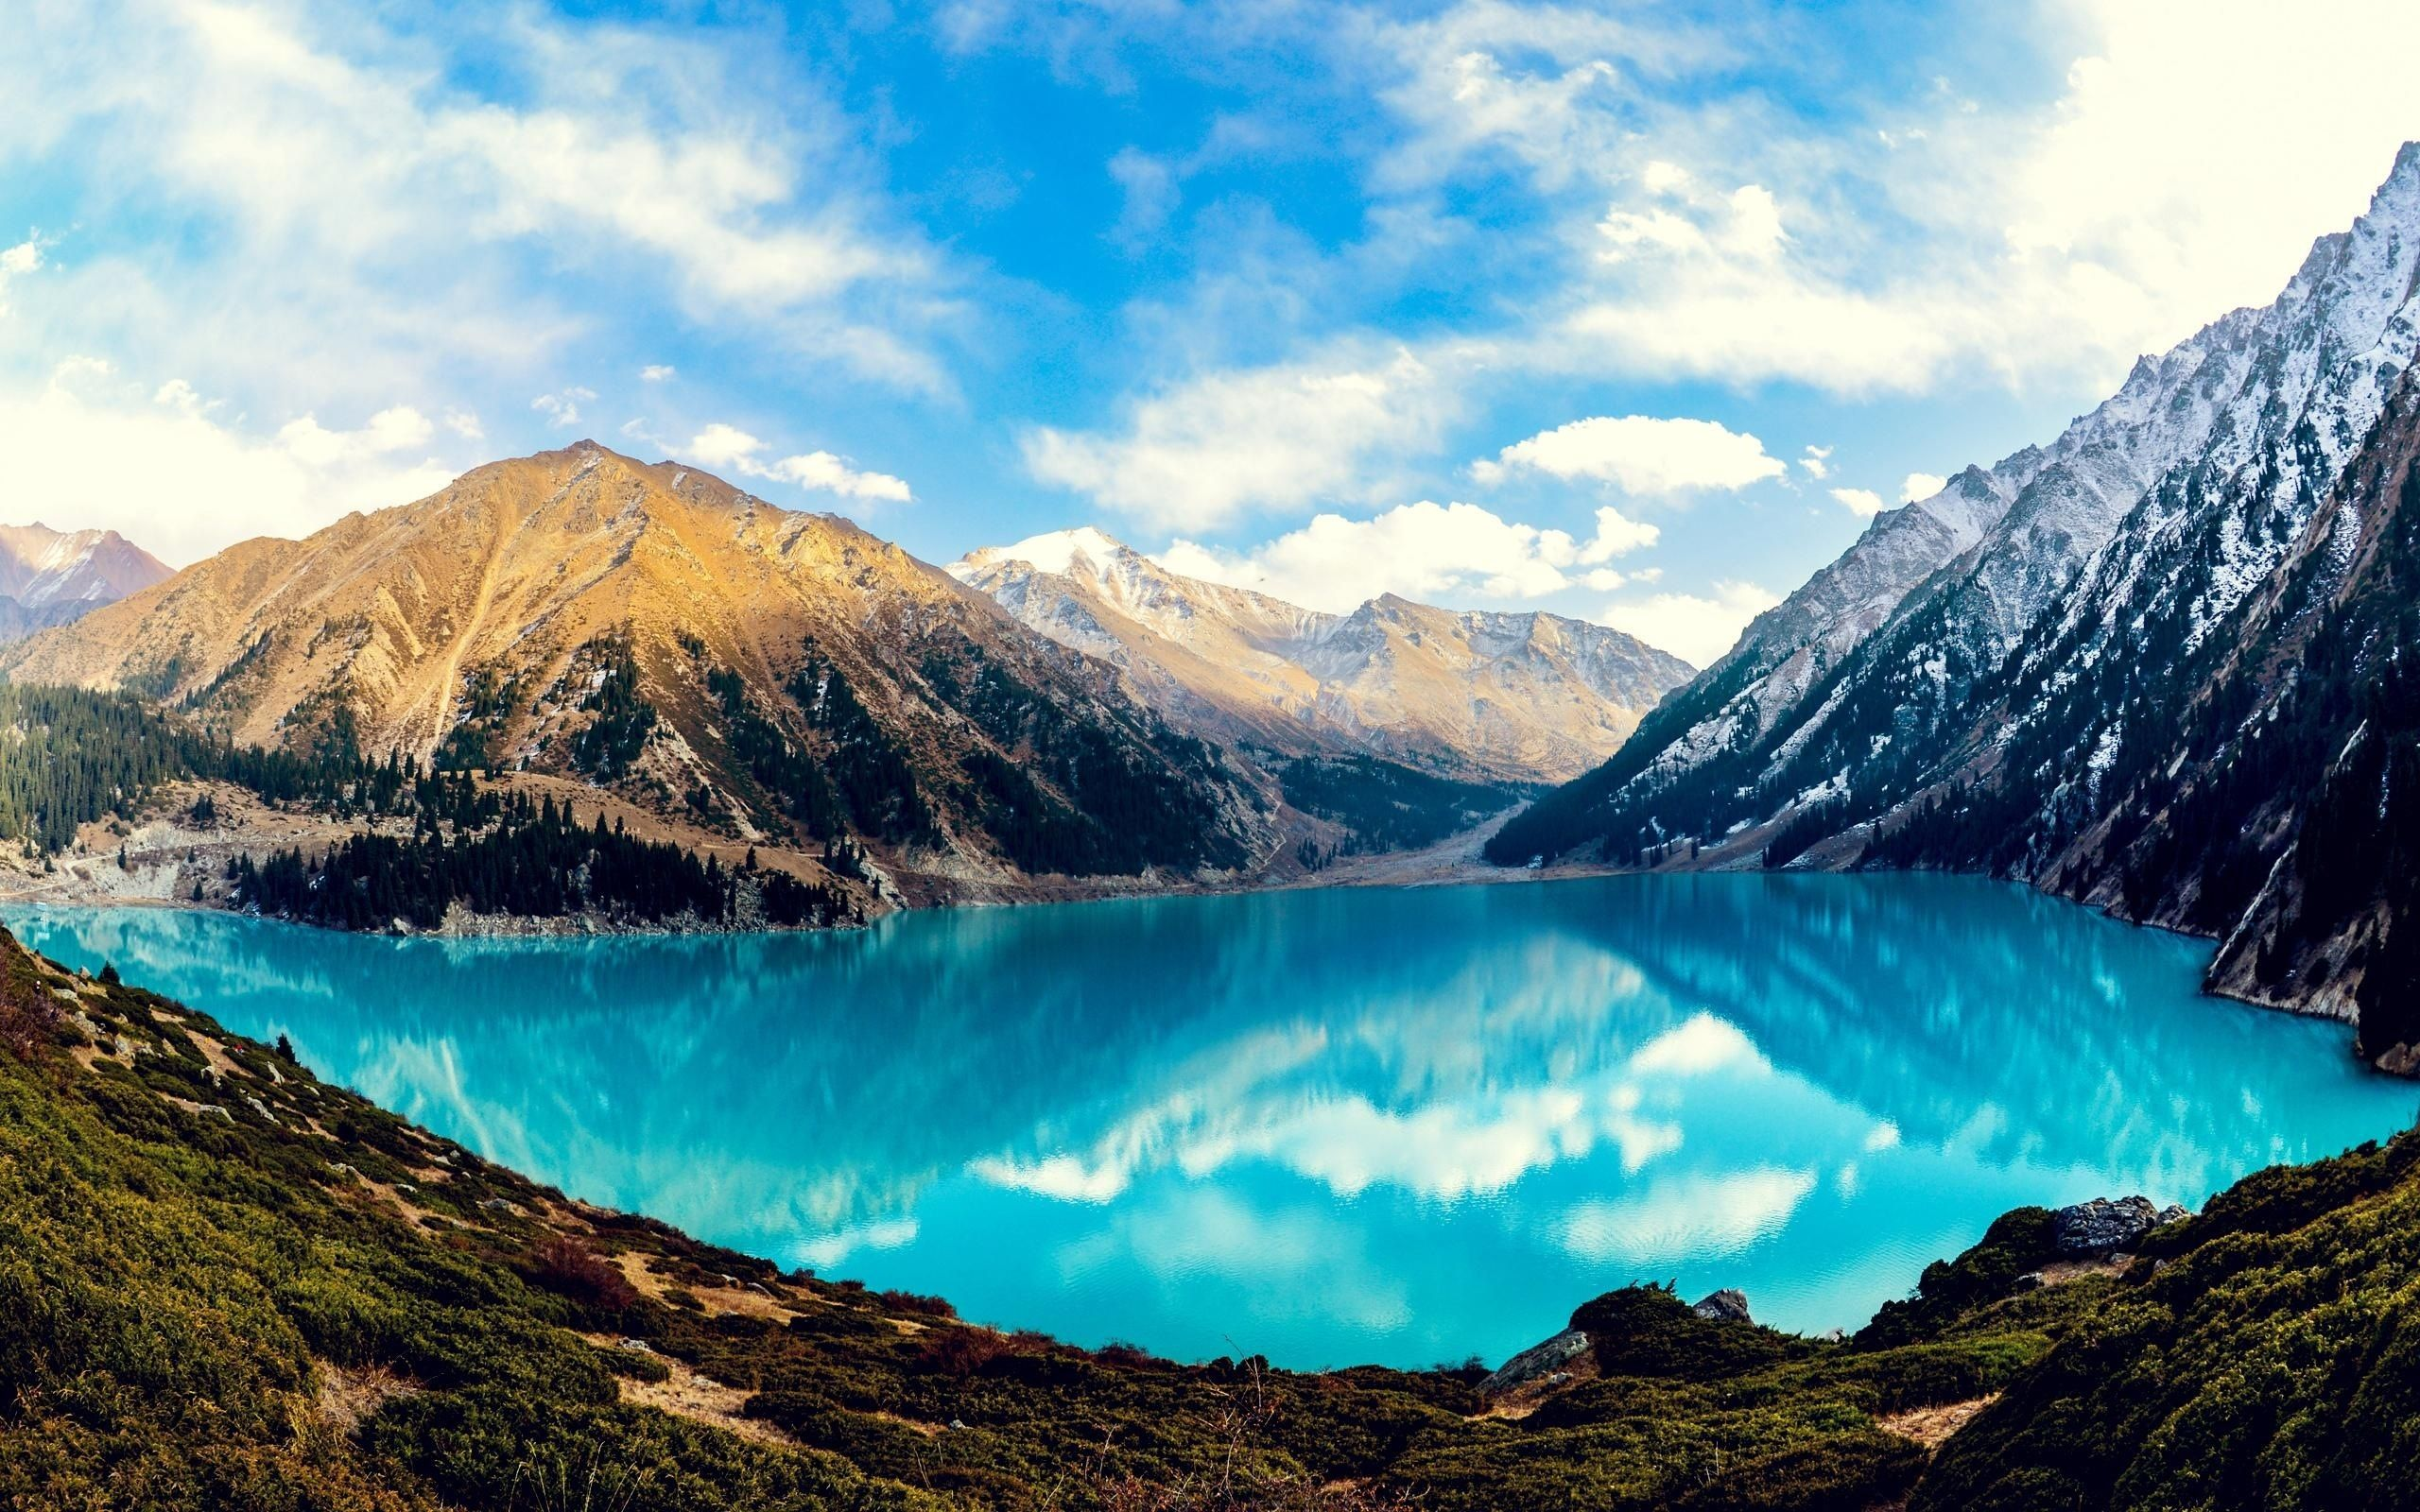 Nature Hd Wallpapers And Desktops Almaty Kazakhstan Travel Landscape Wallpaper Hd wallpaper lake tree trunk mountain